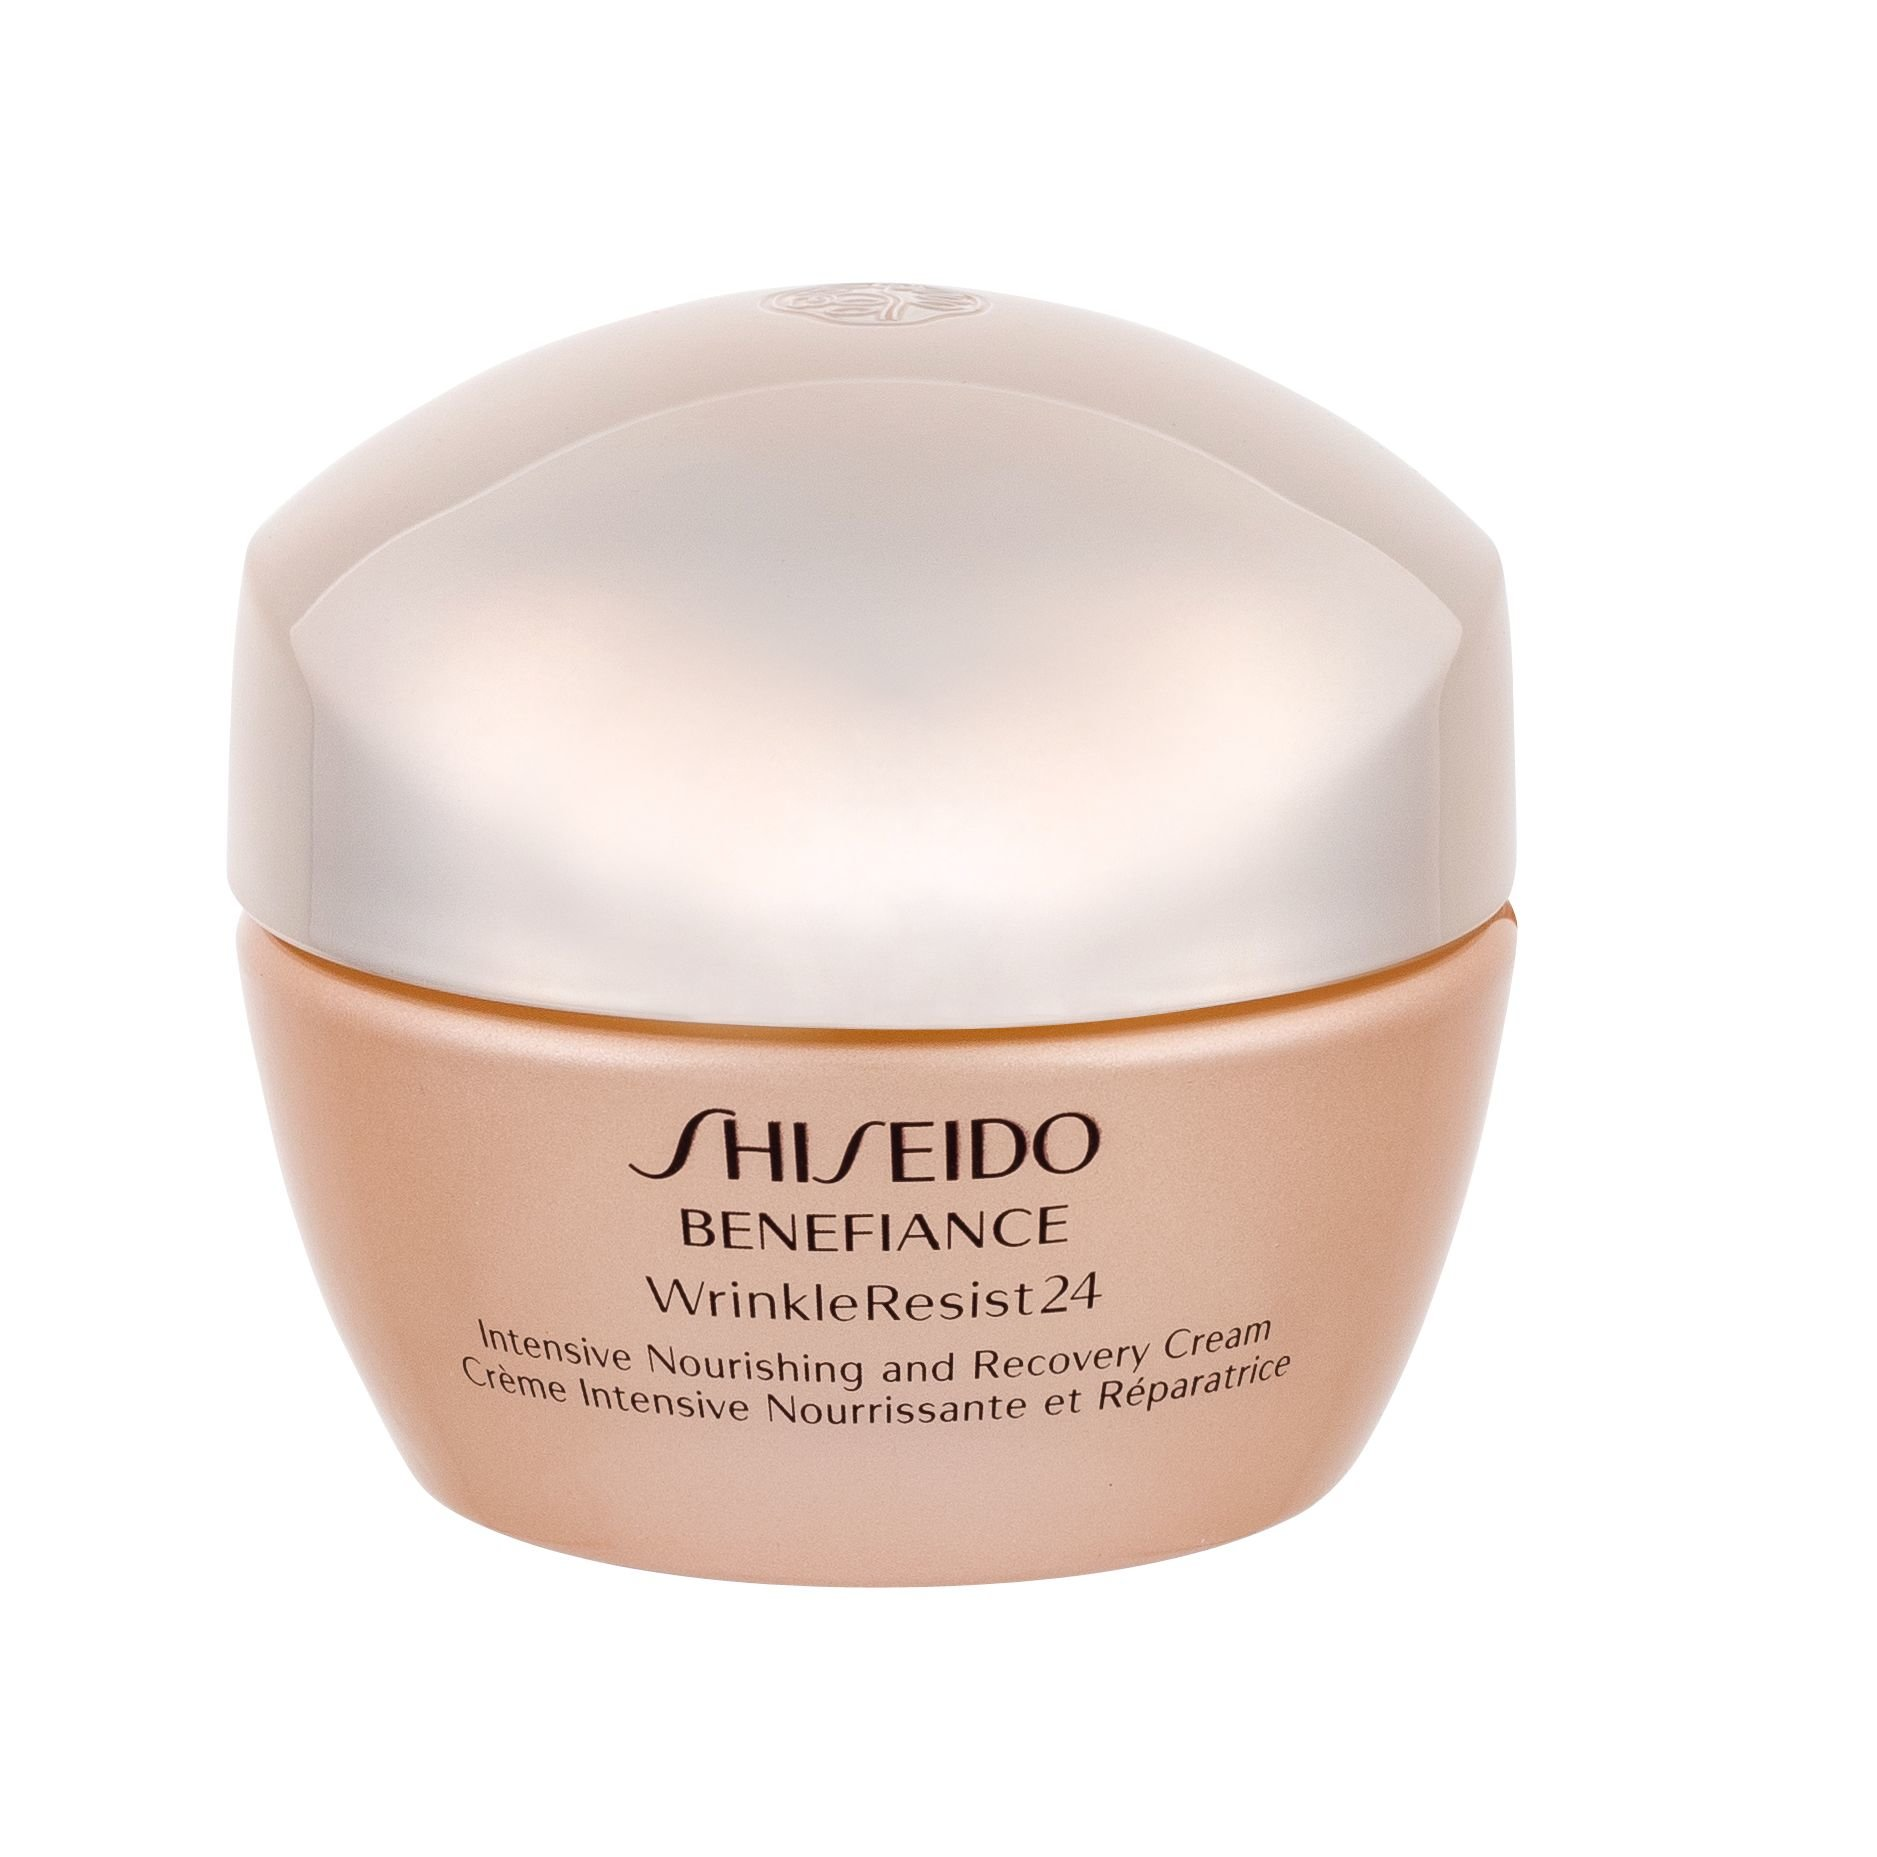 Shiseido Benefiance Wrinkle Resist 24 Day Cream 50ml